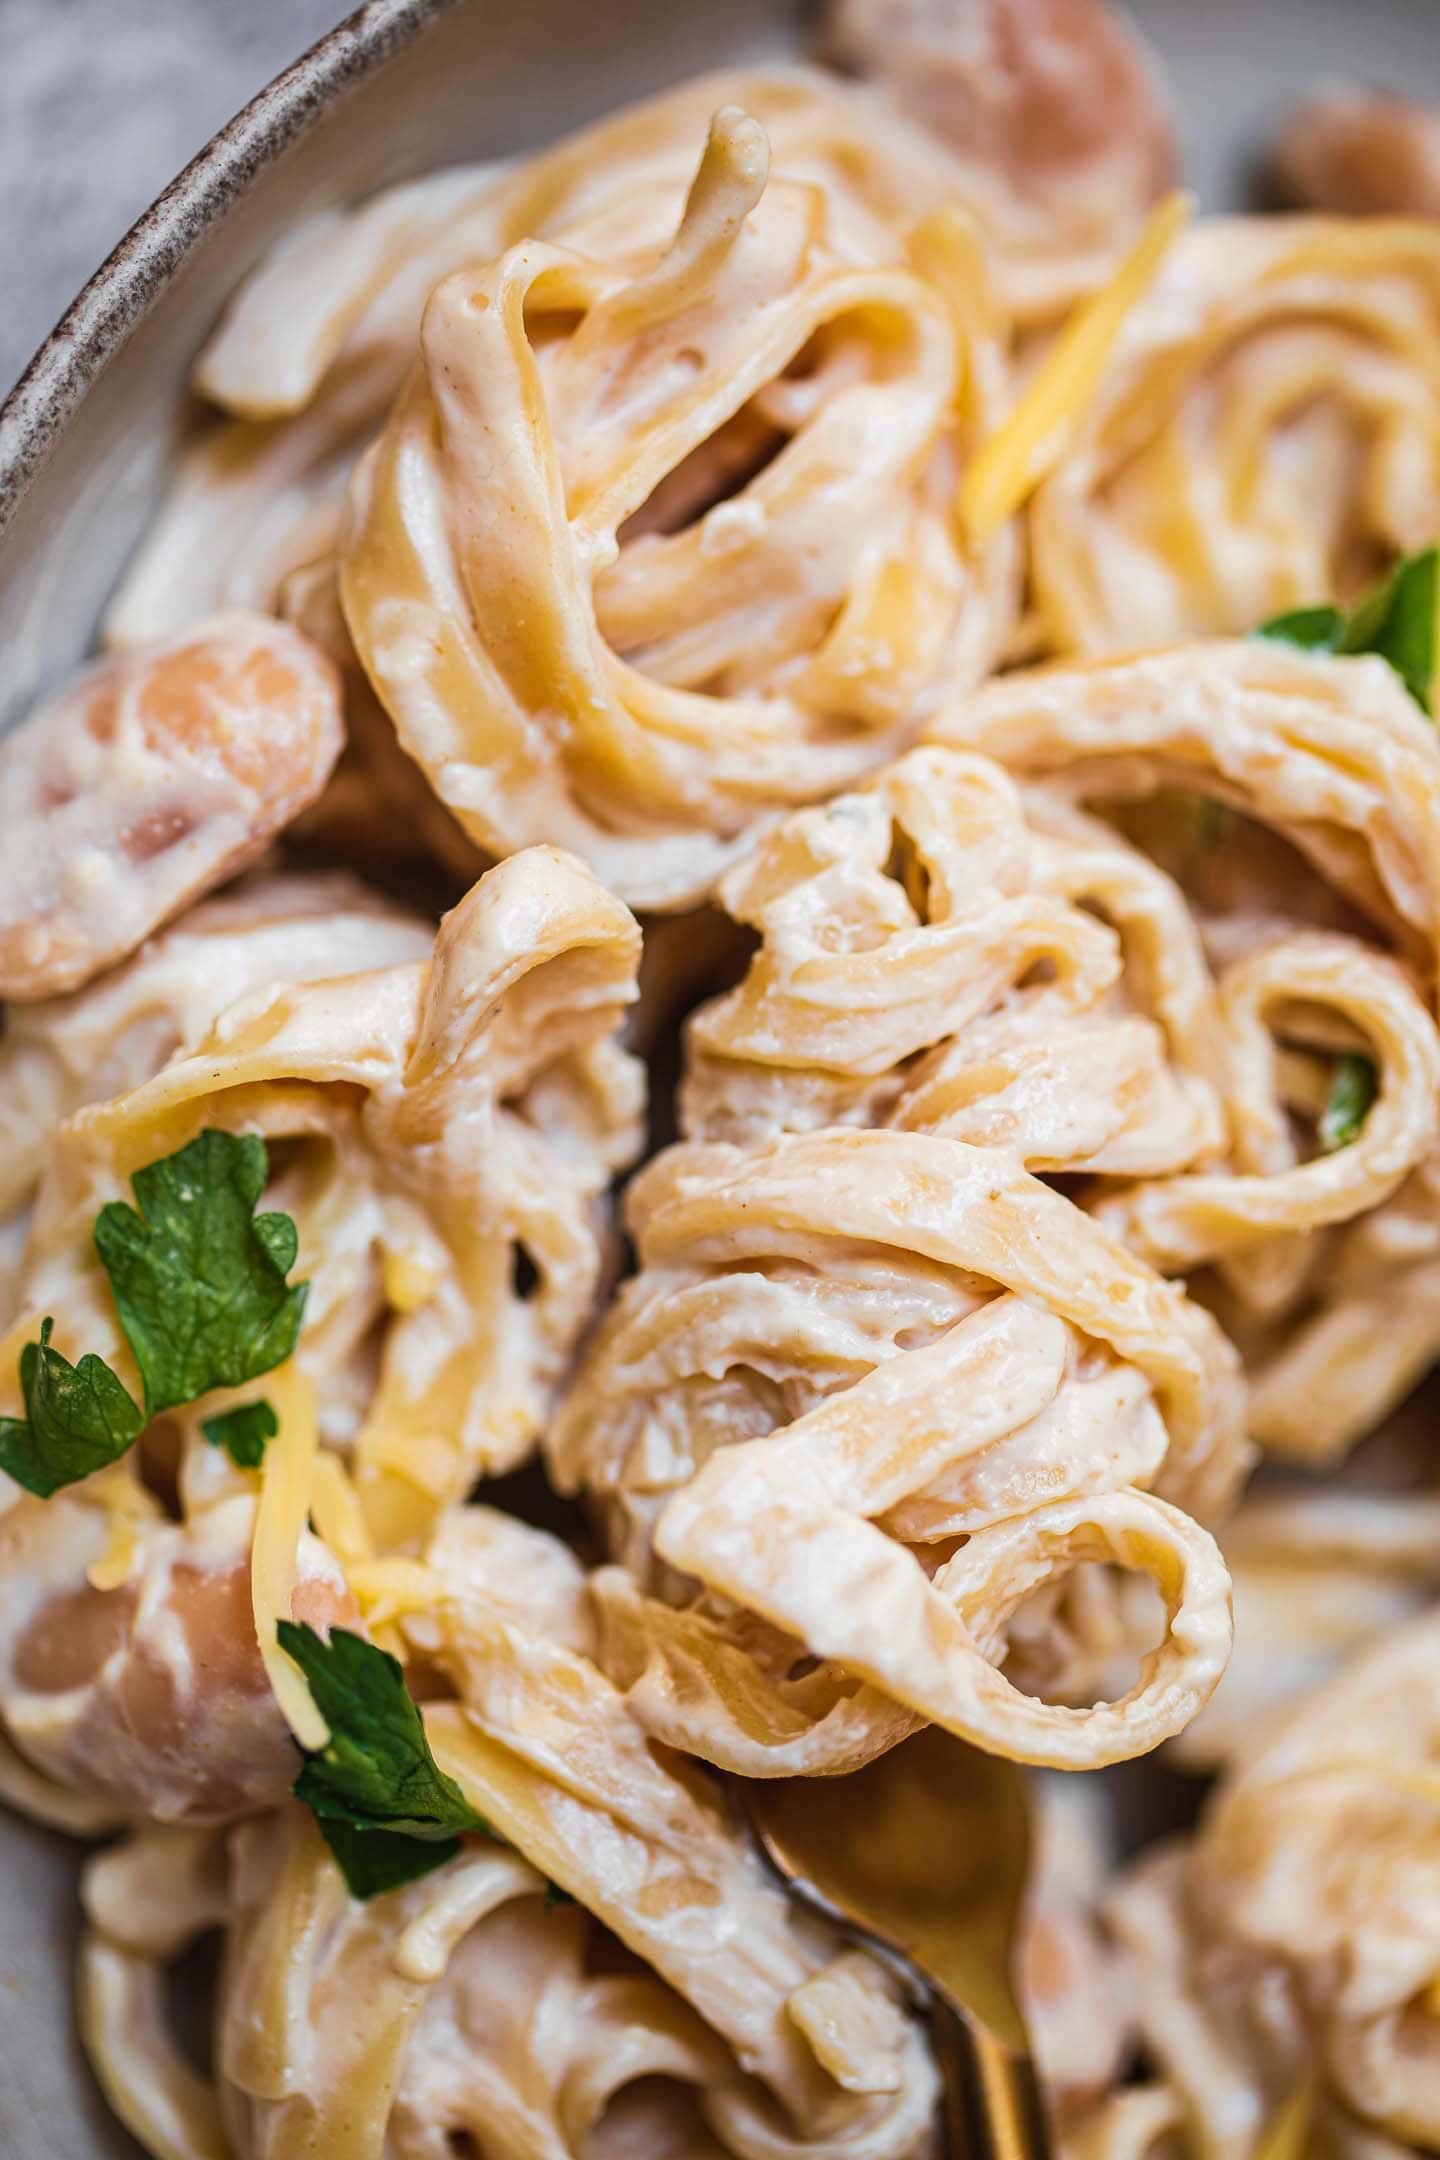 Vegan tahini garlic pasta gluten-free oil-free